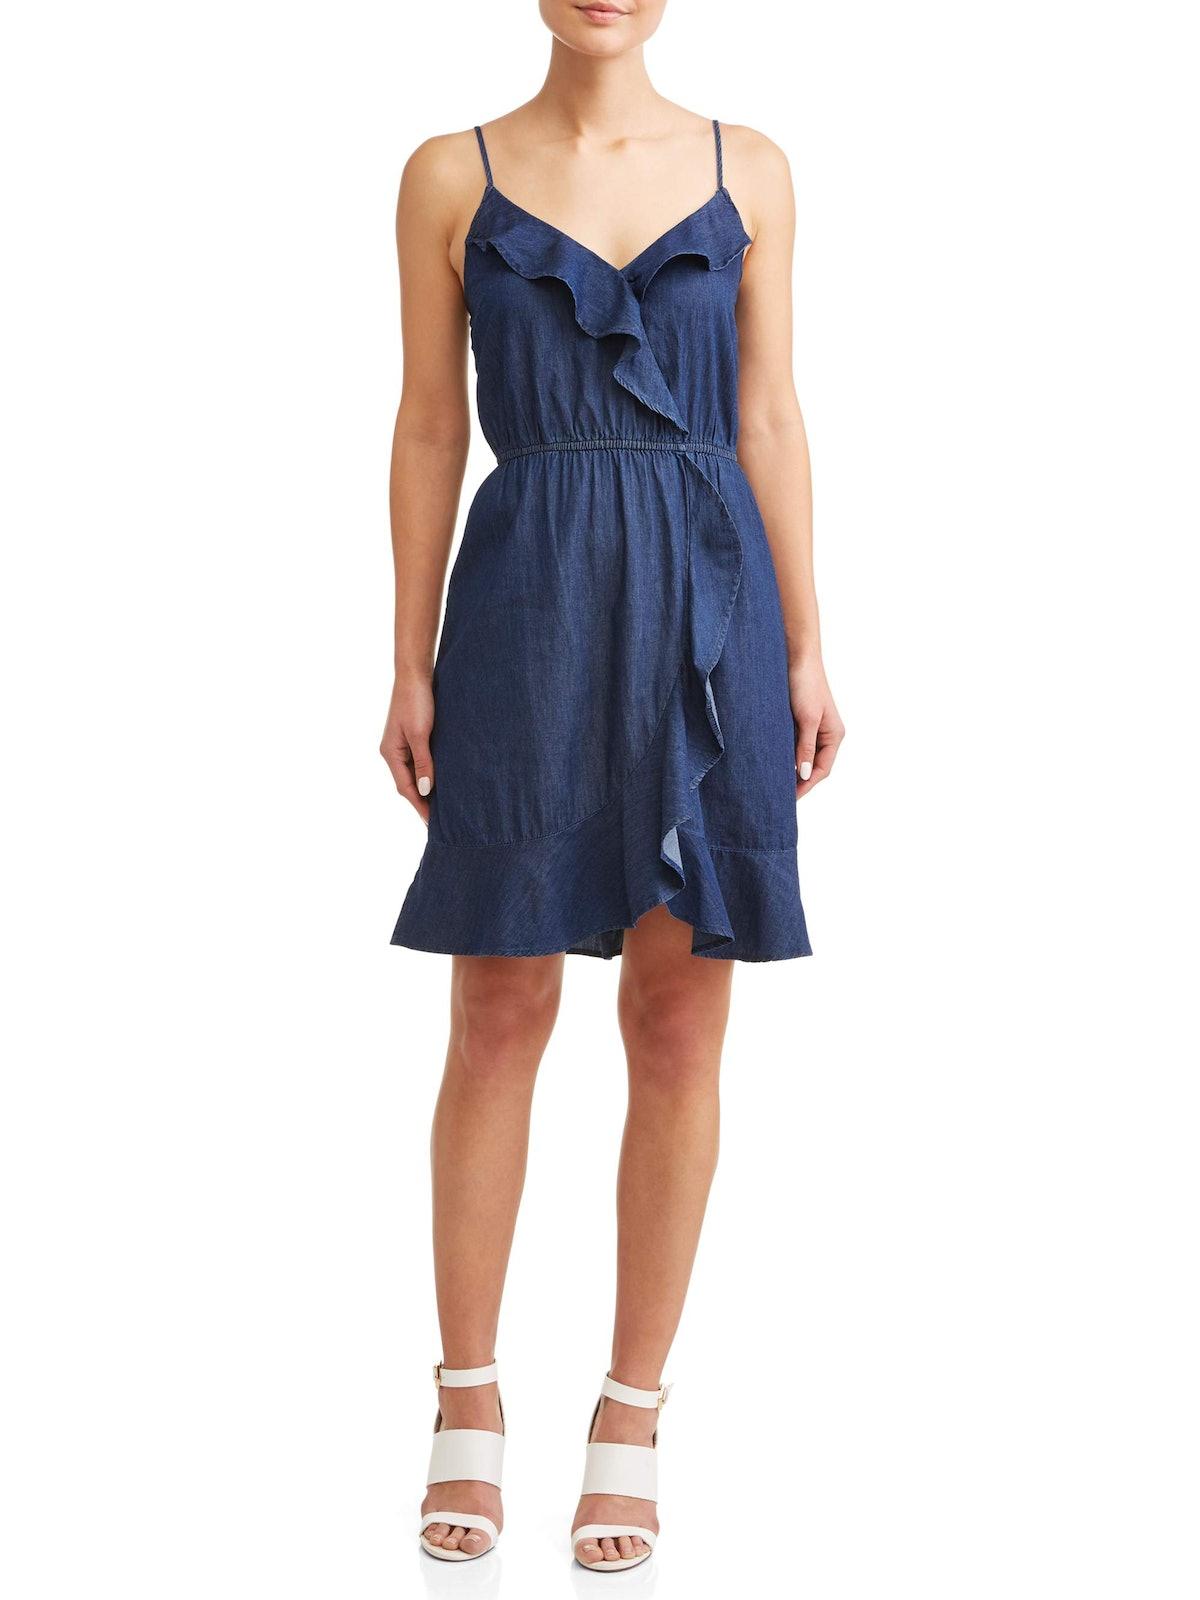 Millenium Ruffle Front Denim Dress